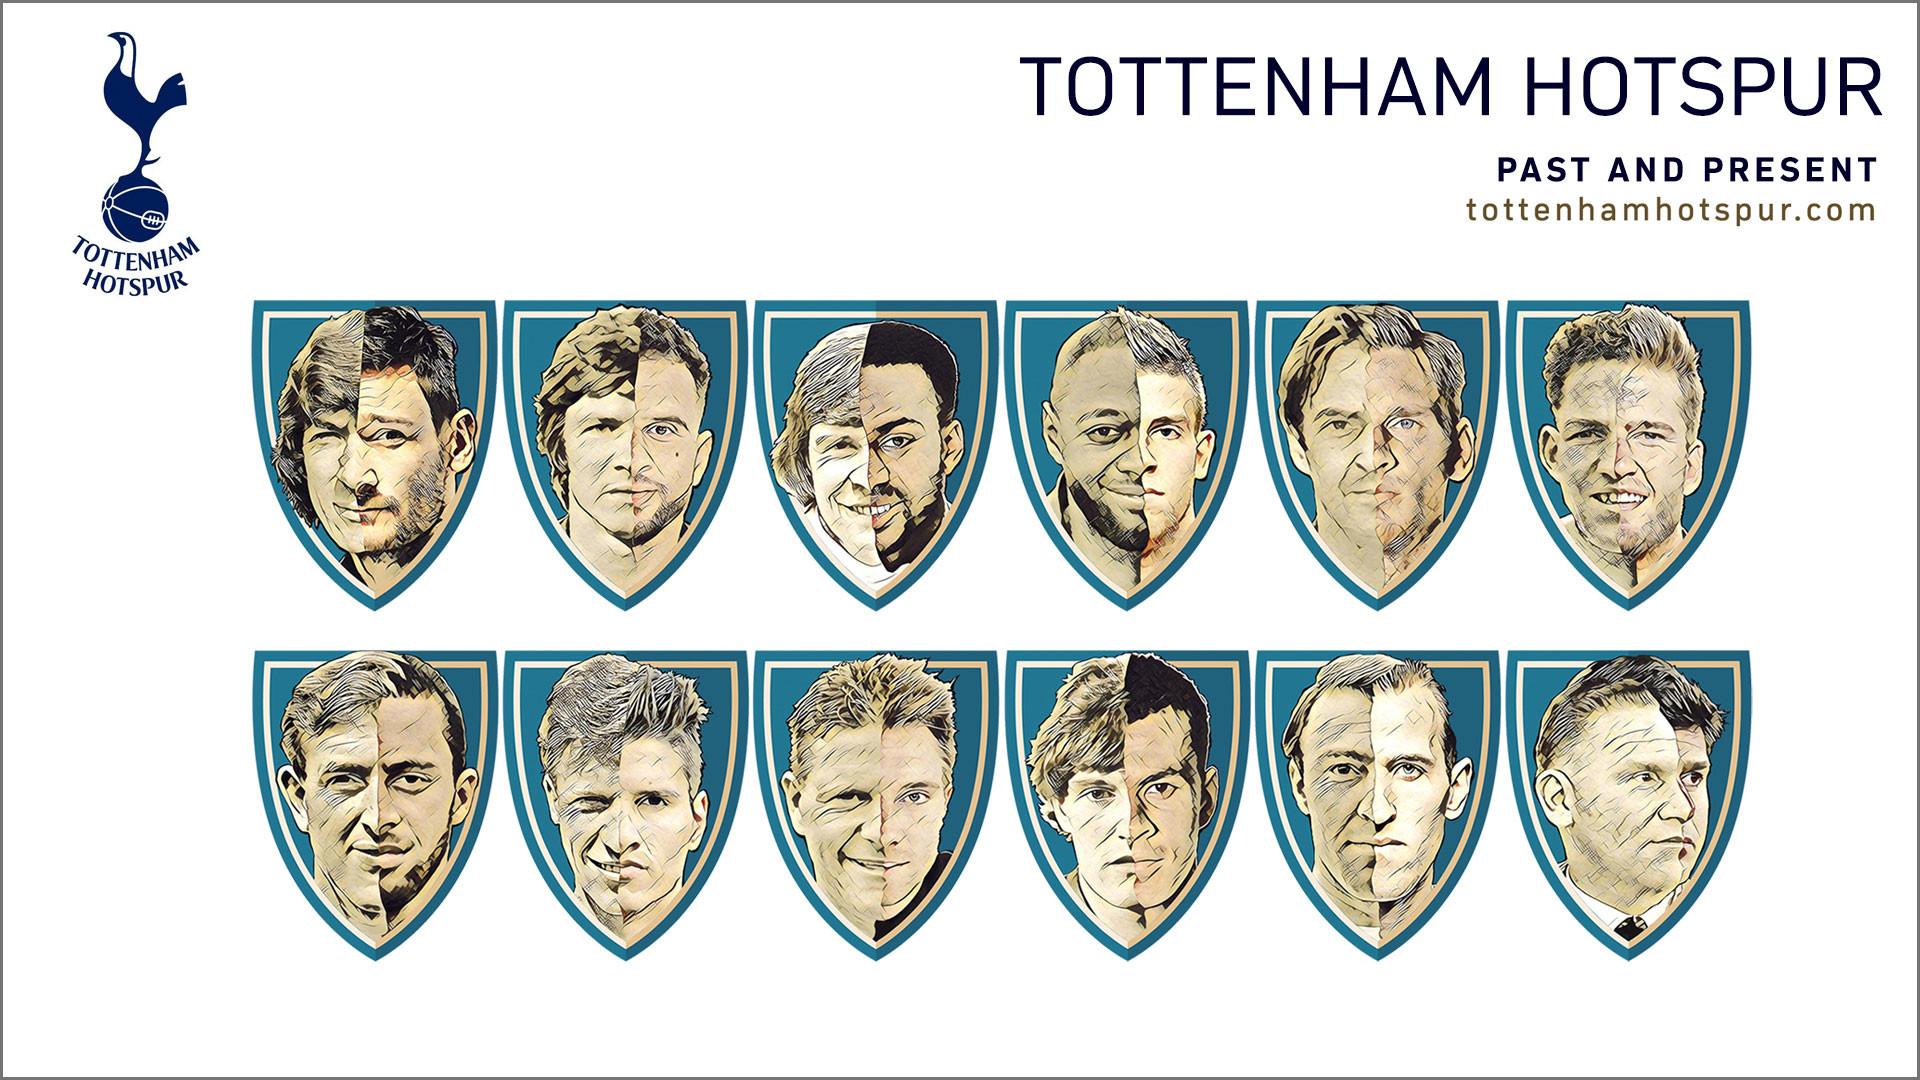 Past and Present – Tottenham Hotspur